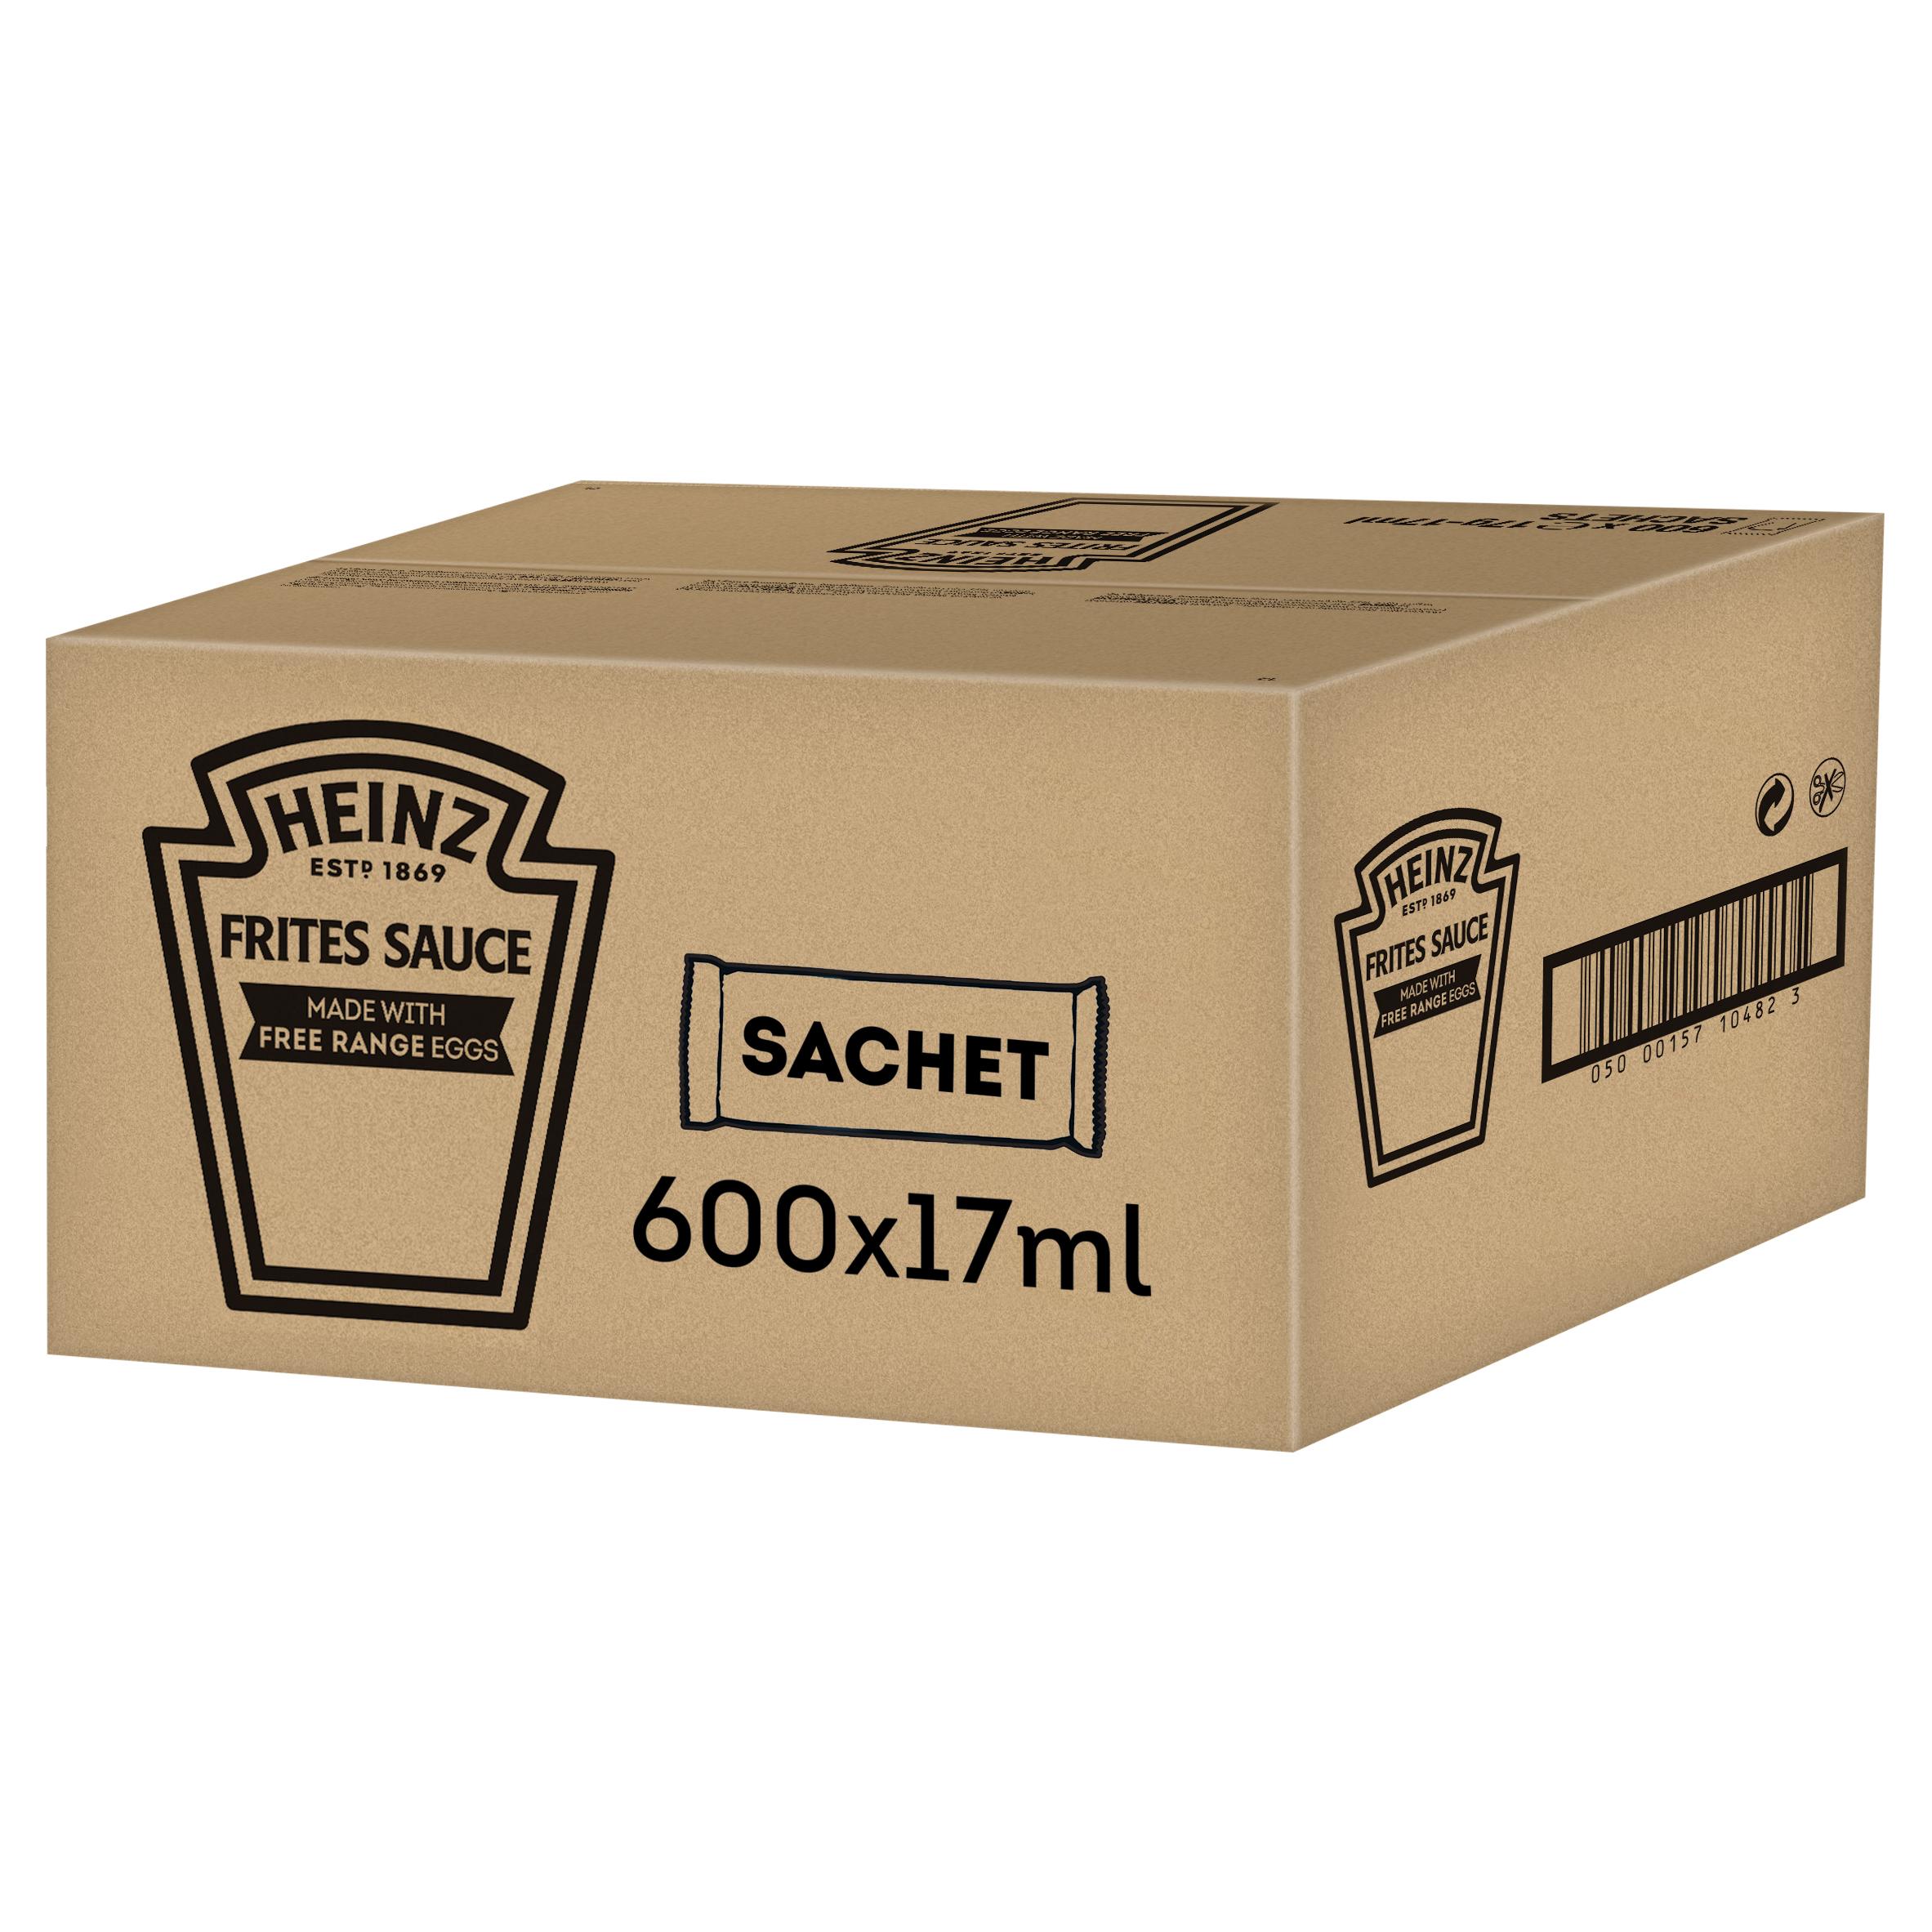 Heinz fritessaus sachet 17ml